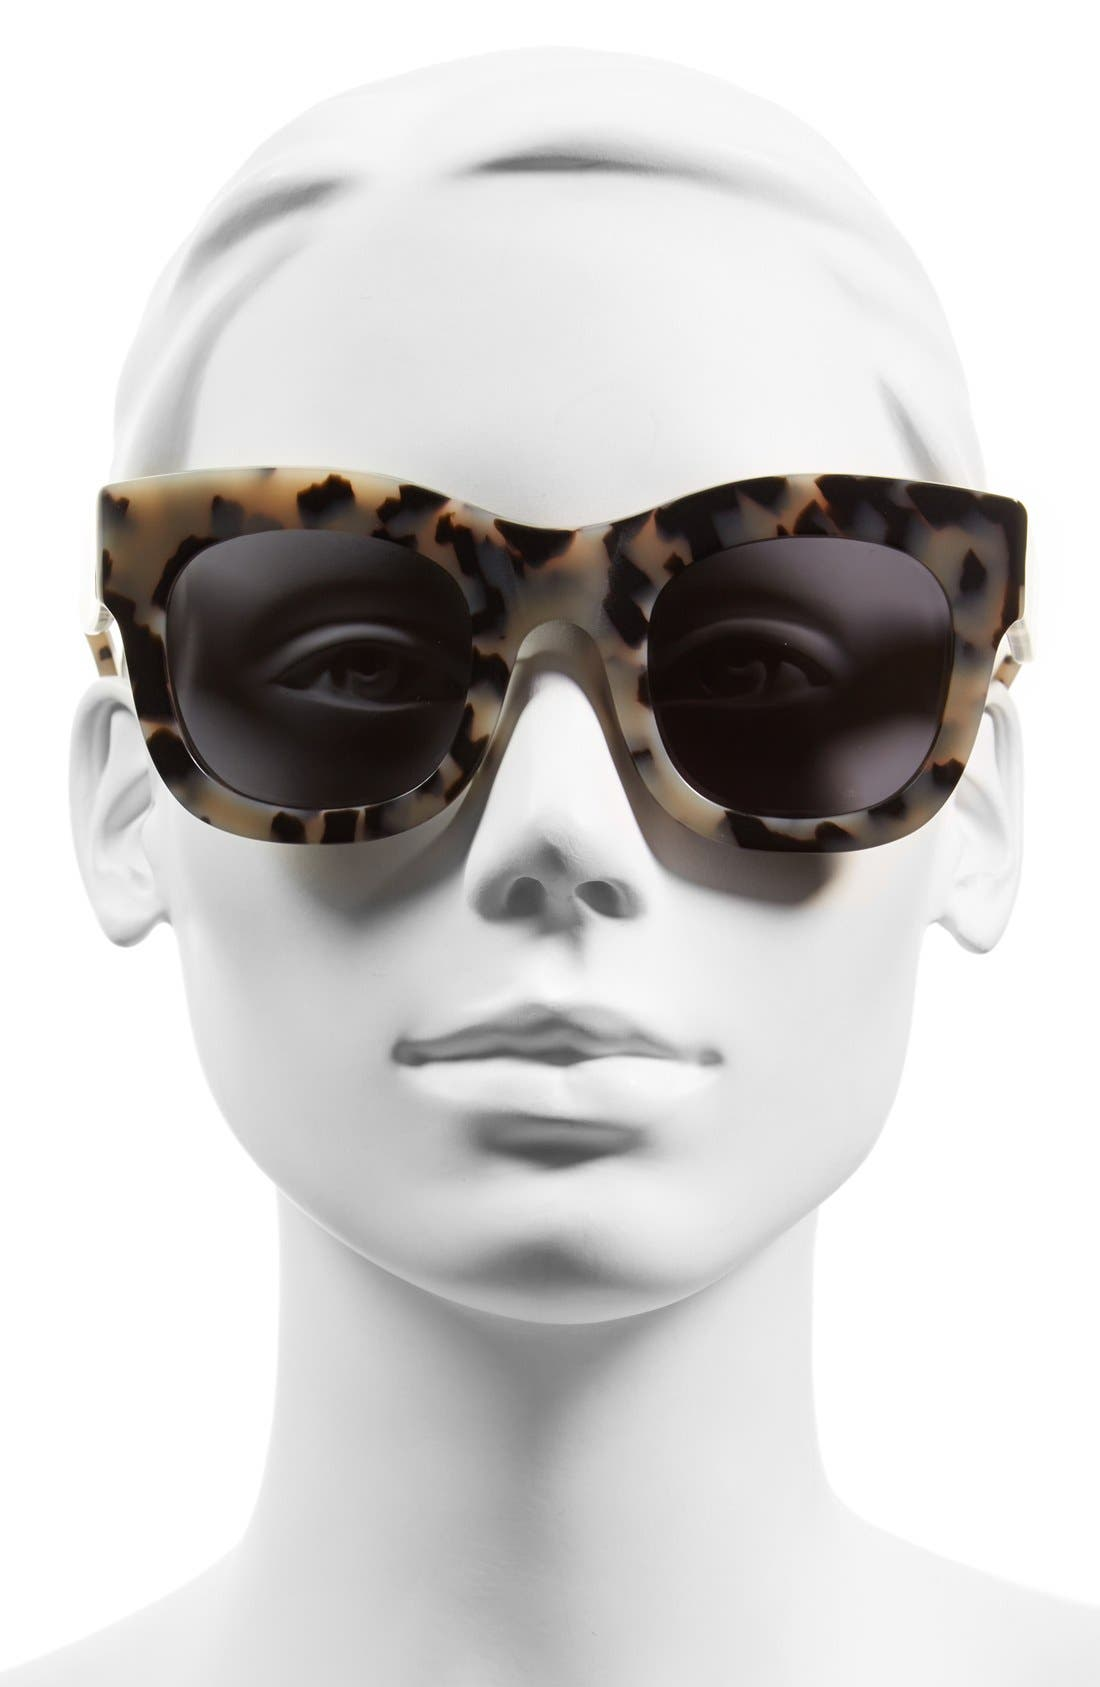 'Hamilton' 49mm Retro Sunglasses,                             Alternate thumbnail 15, color,